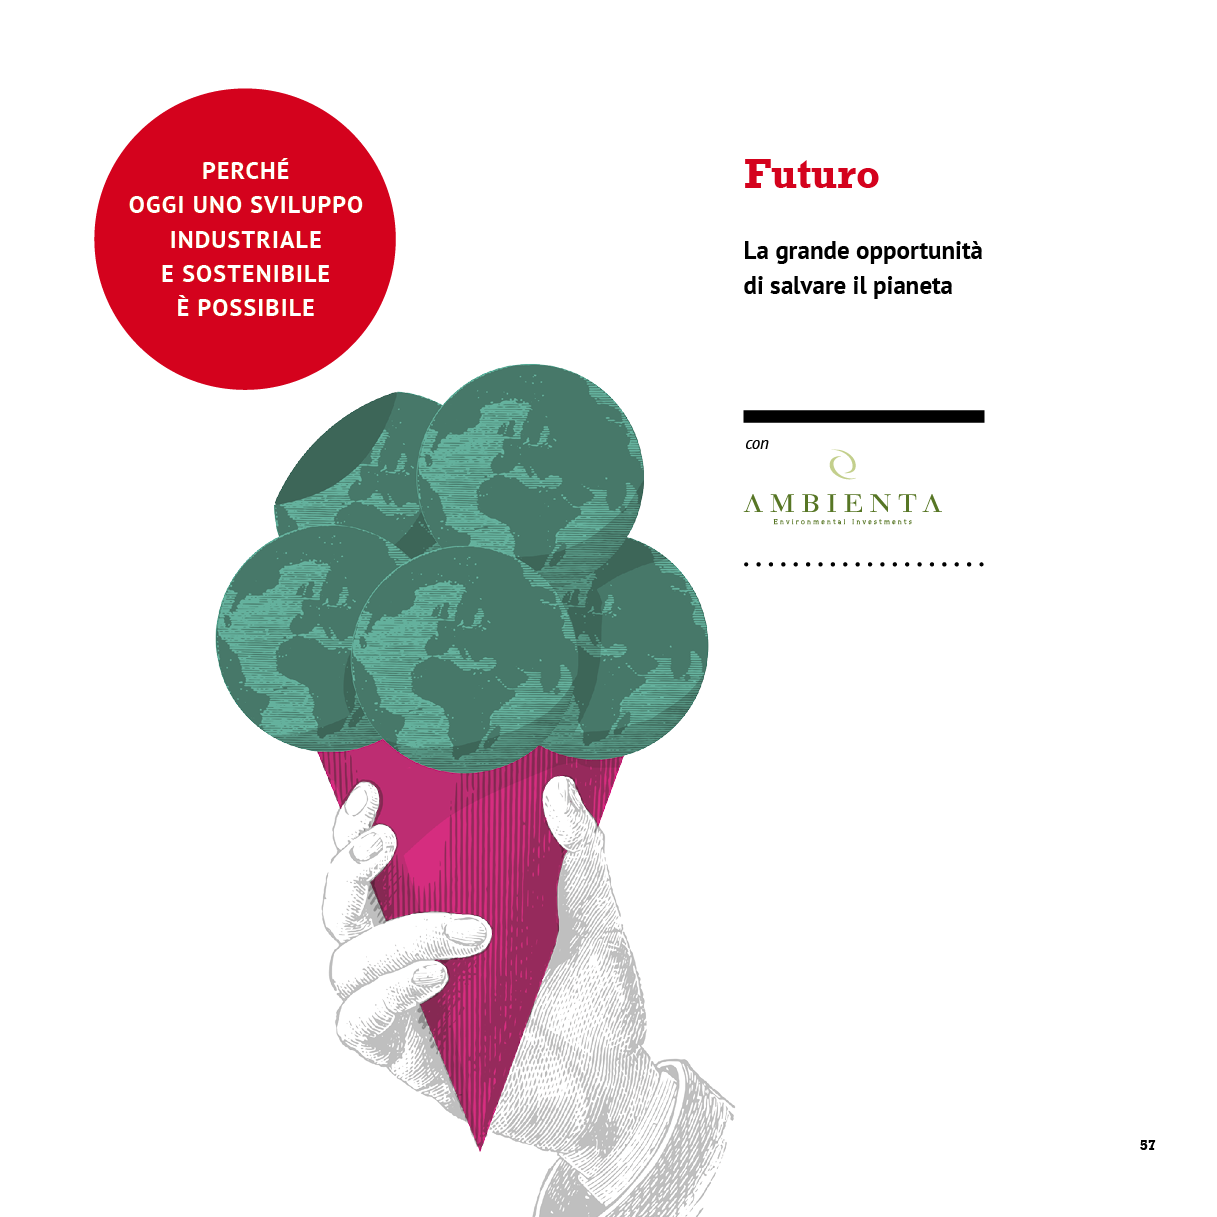 catalogo Librì Futuro cover